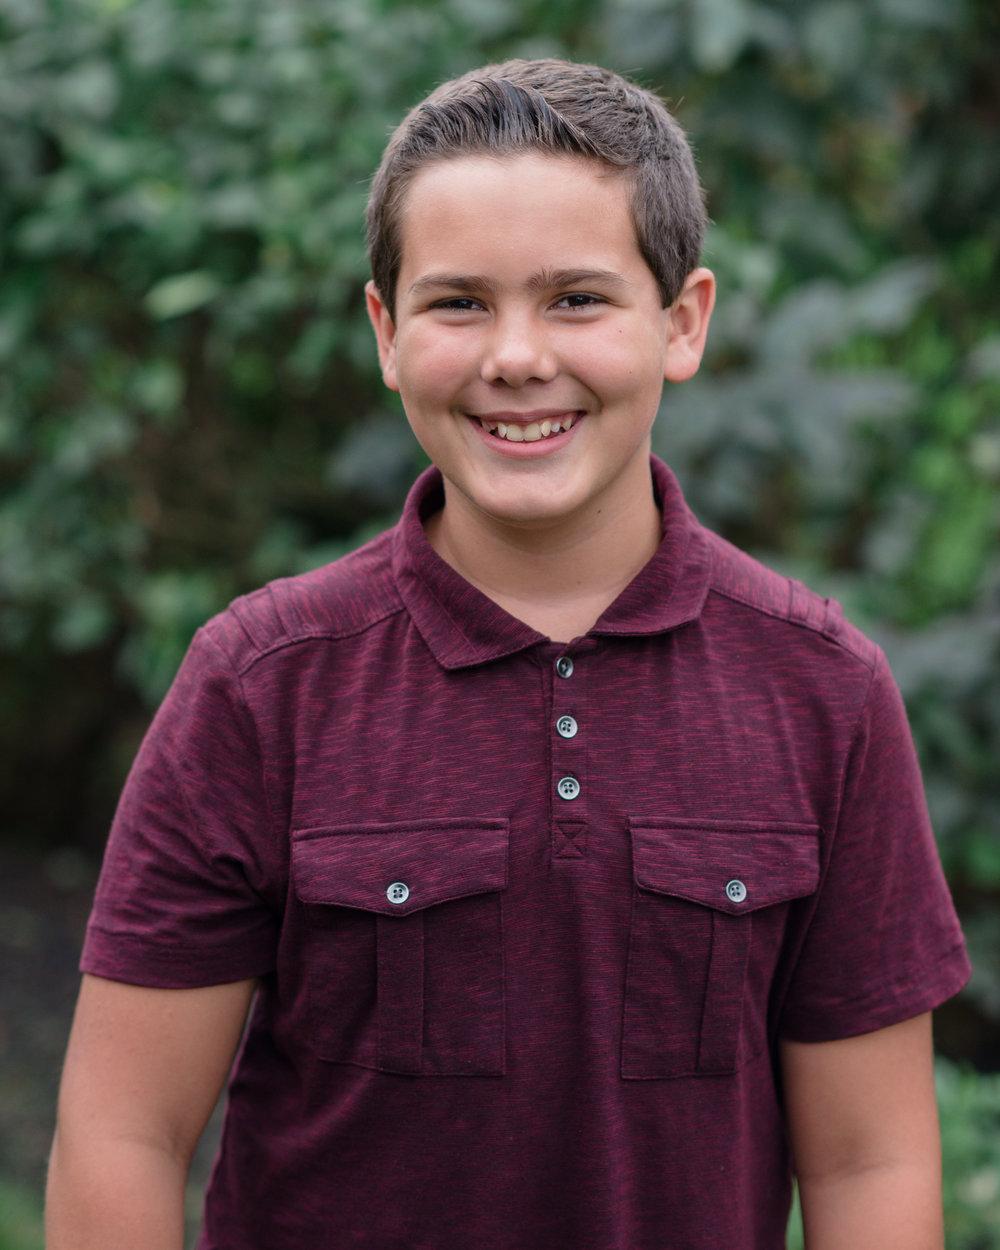 Kevin Seventh Grade | TetherAndFly.com